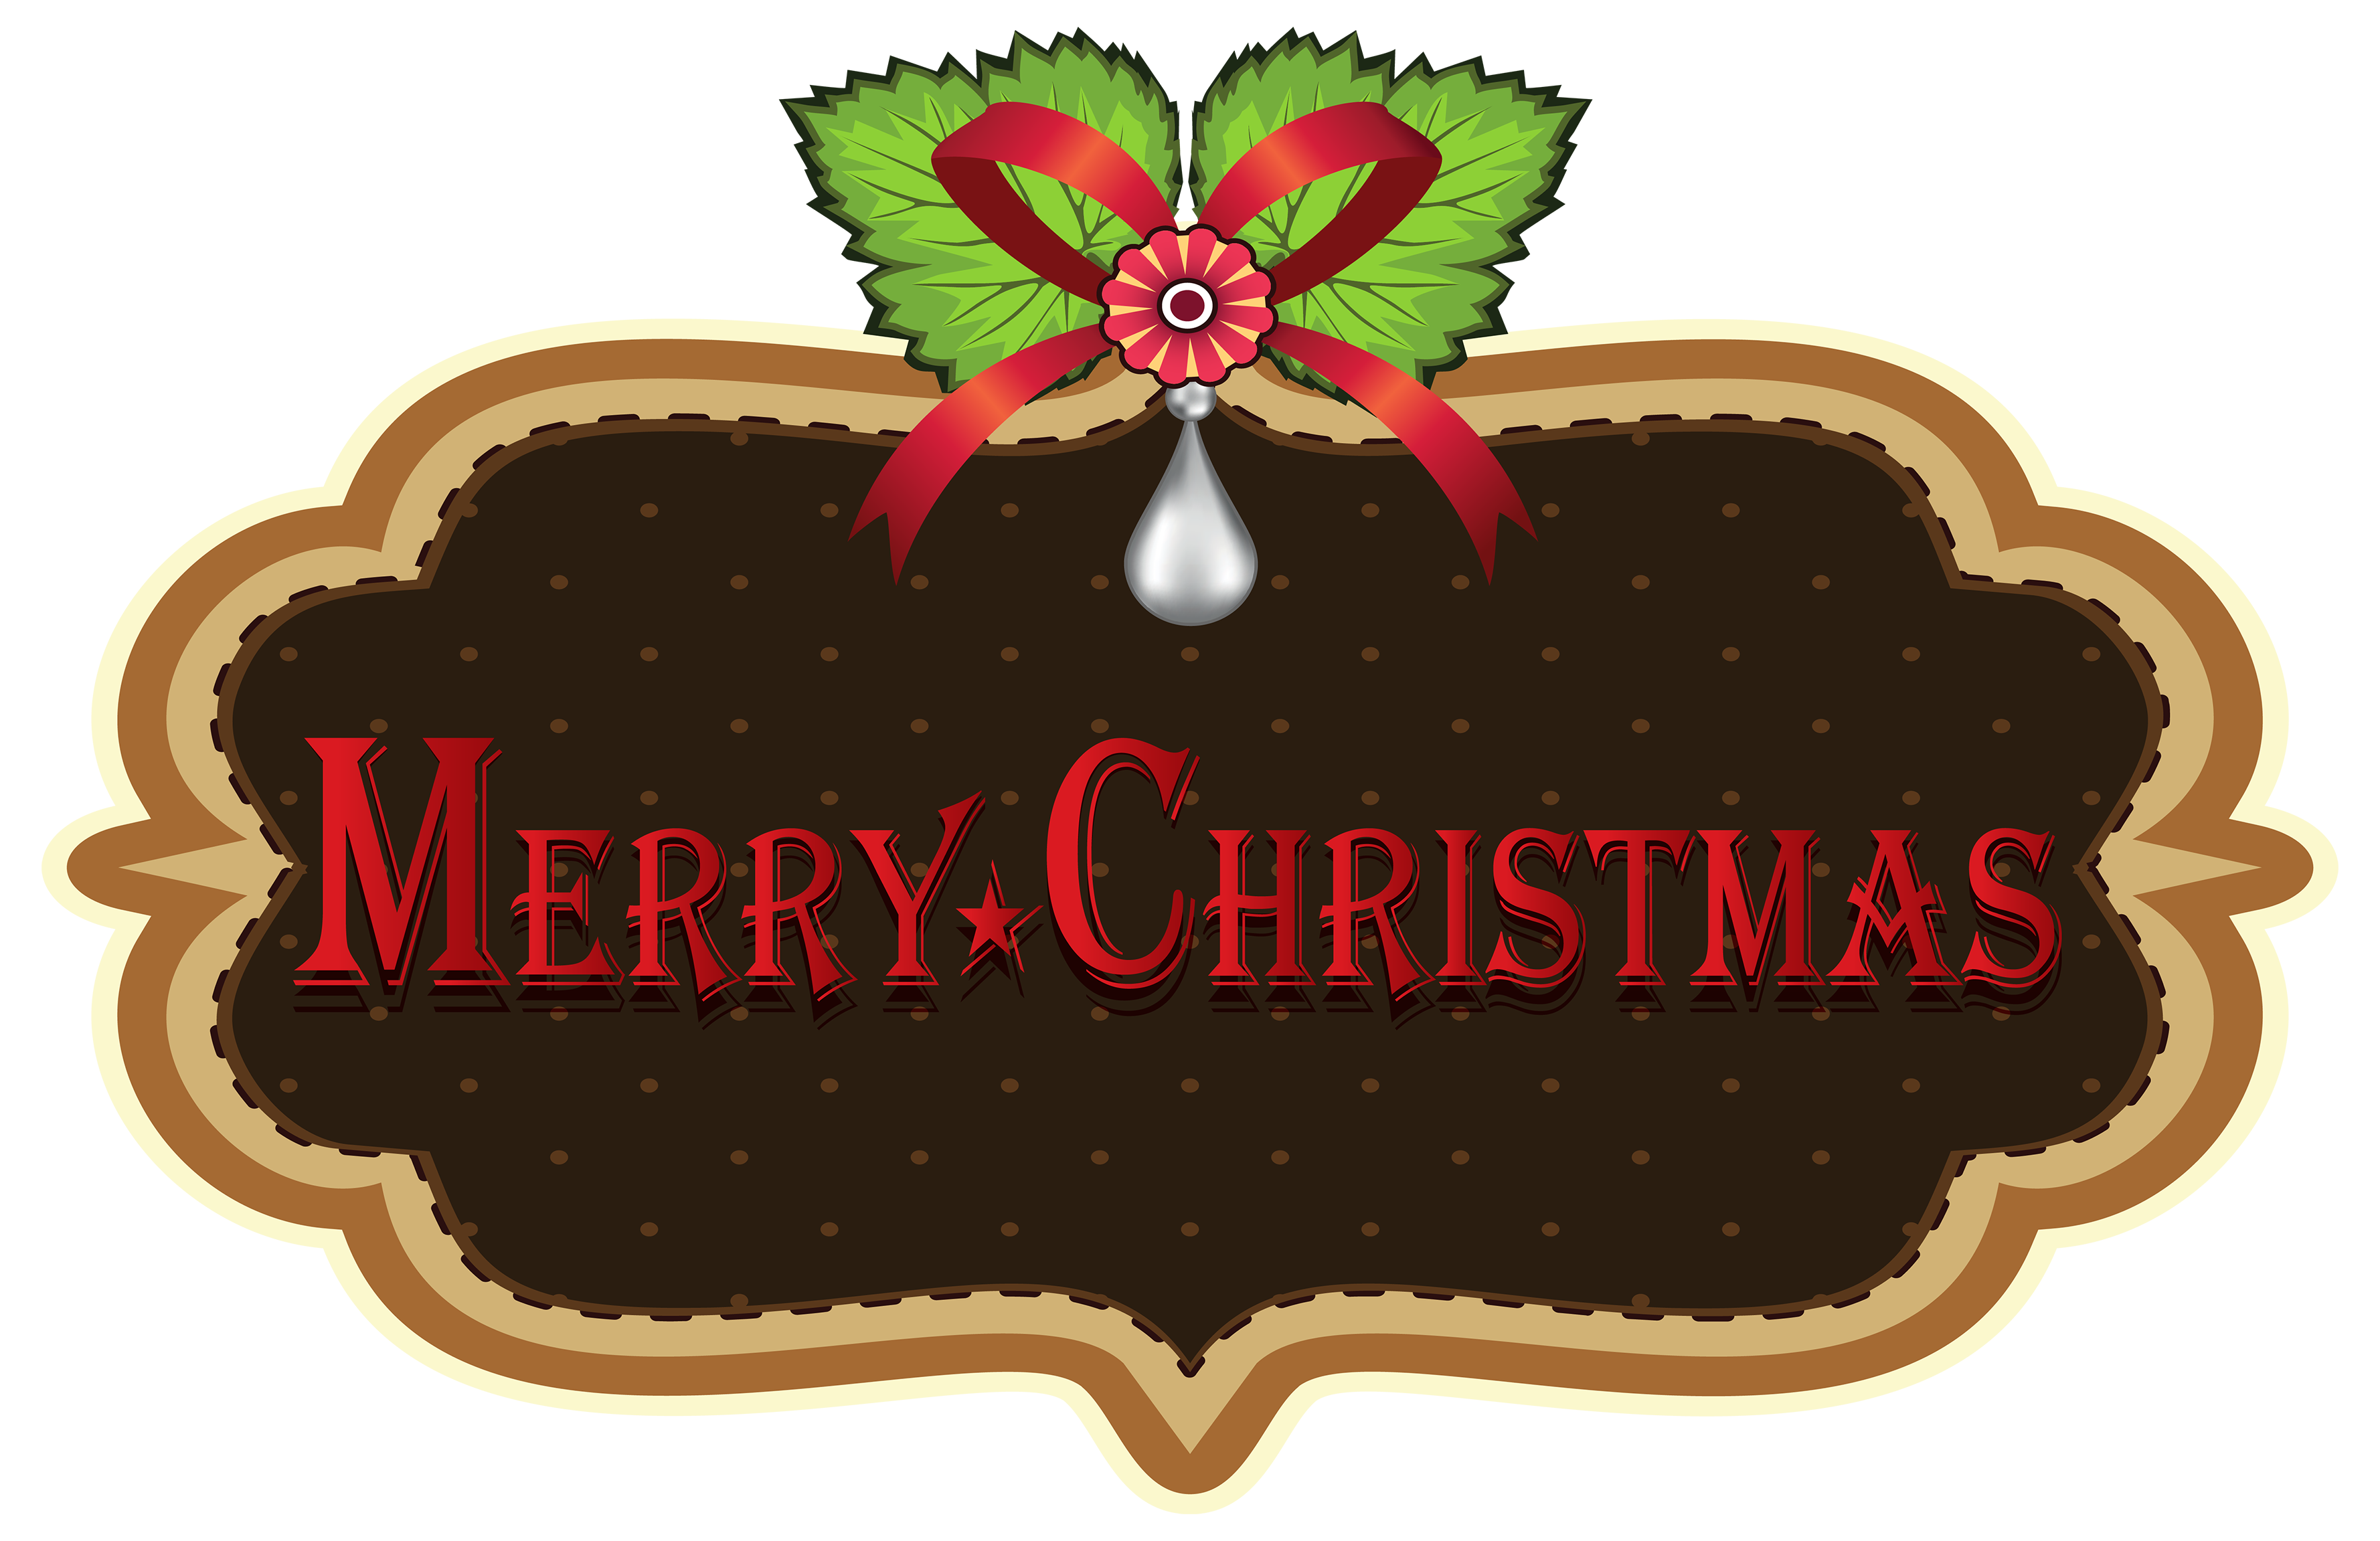 Christmas sayings clipart graphic royalty free stock Pin by Antonia Mendez on ETIQUETAS DE NAVIDAD | Pinterest graphic royalty free stock